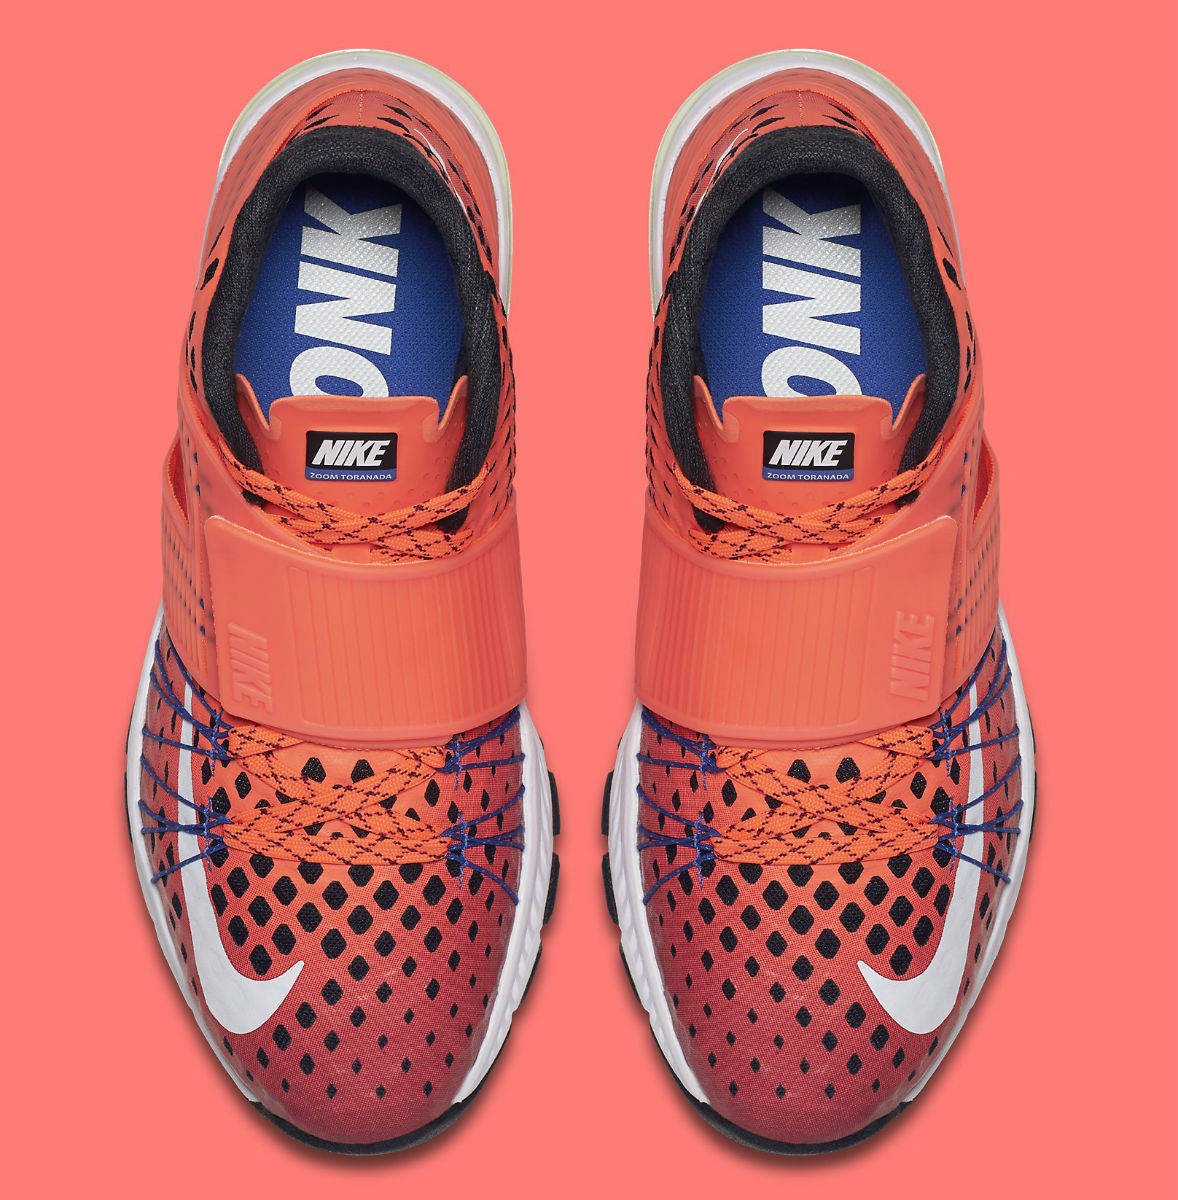 Nike Zoom Train Toranada Gronk Red Top 848507-600